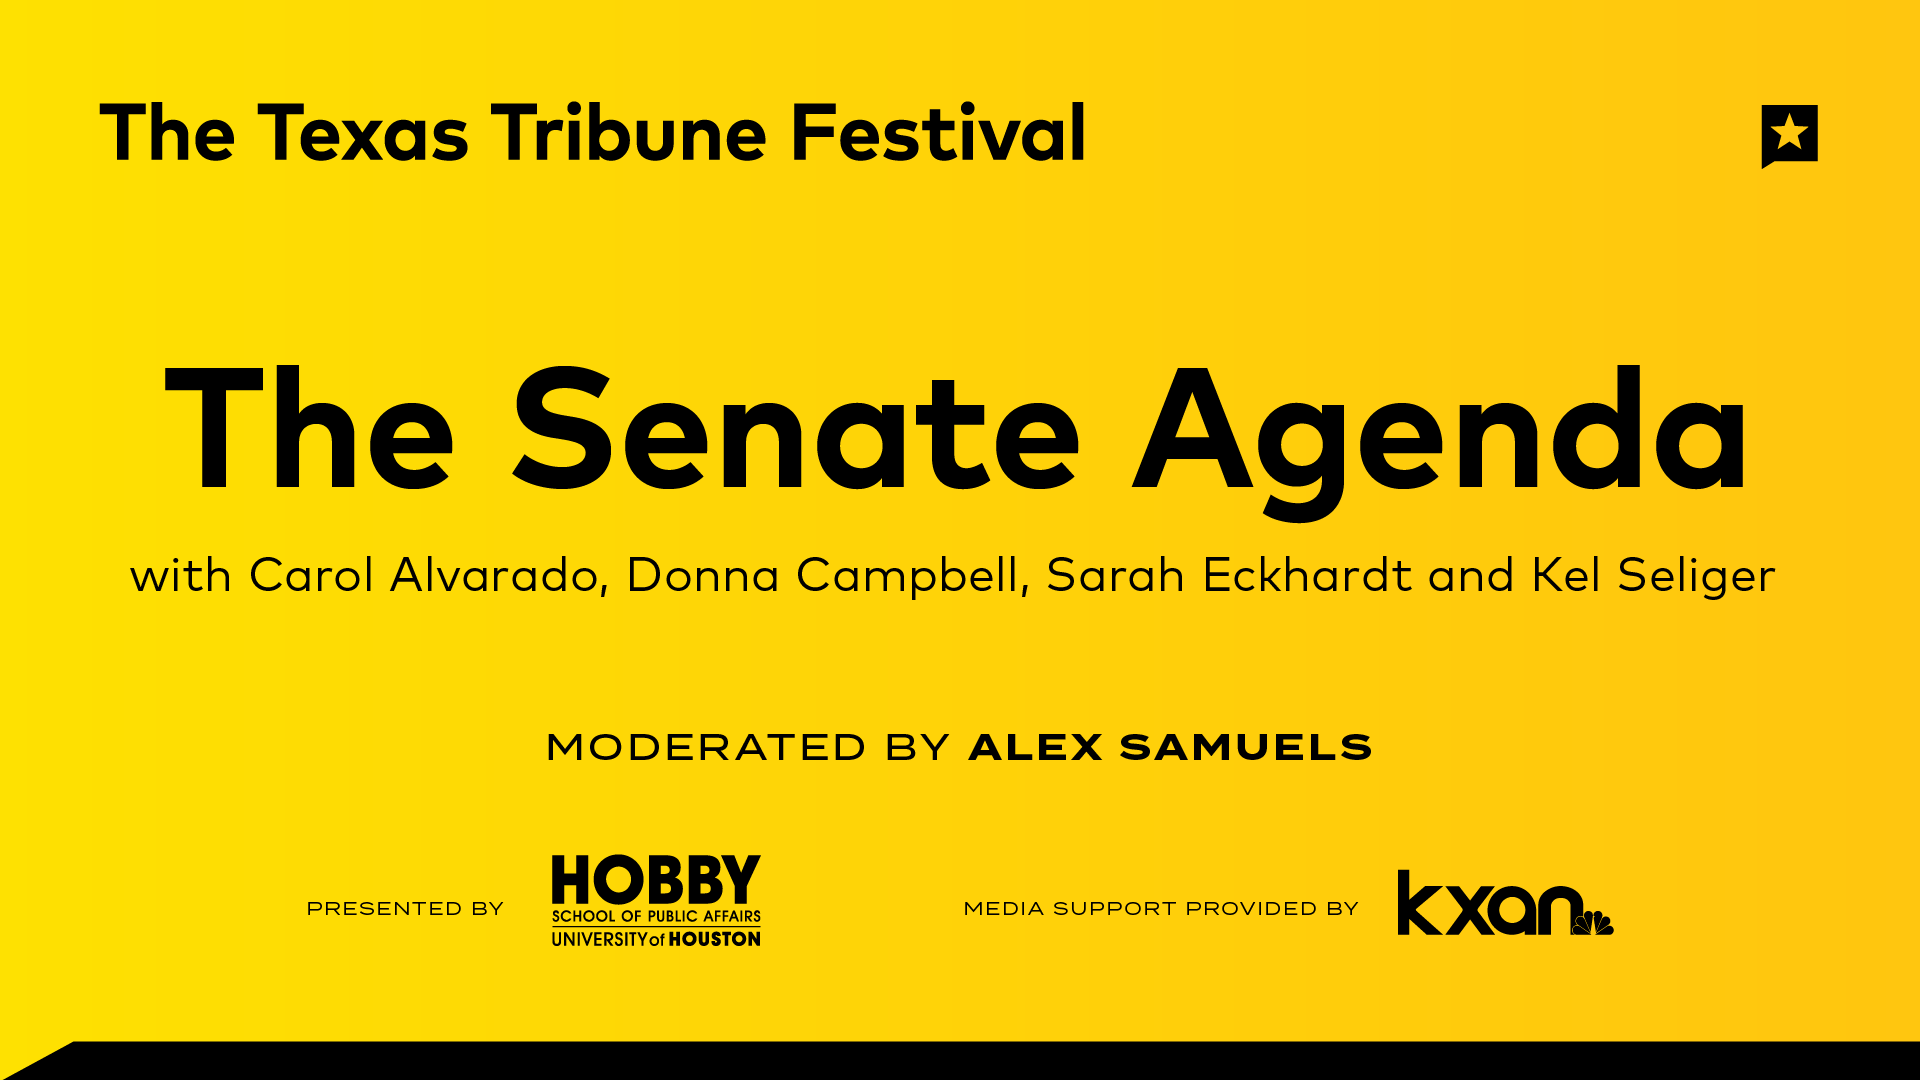 The Senate Agenda